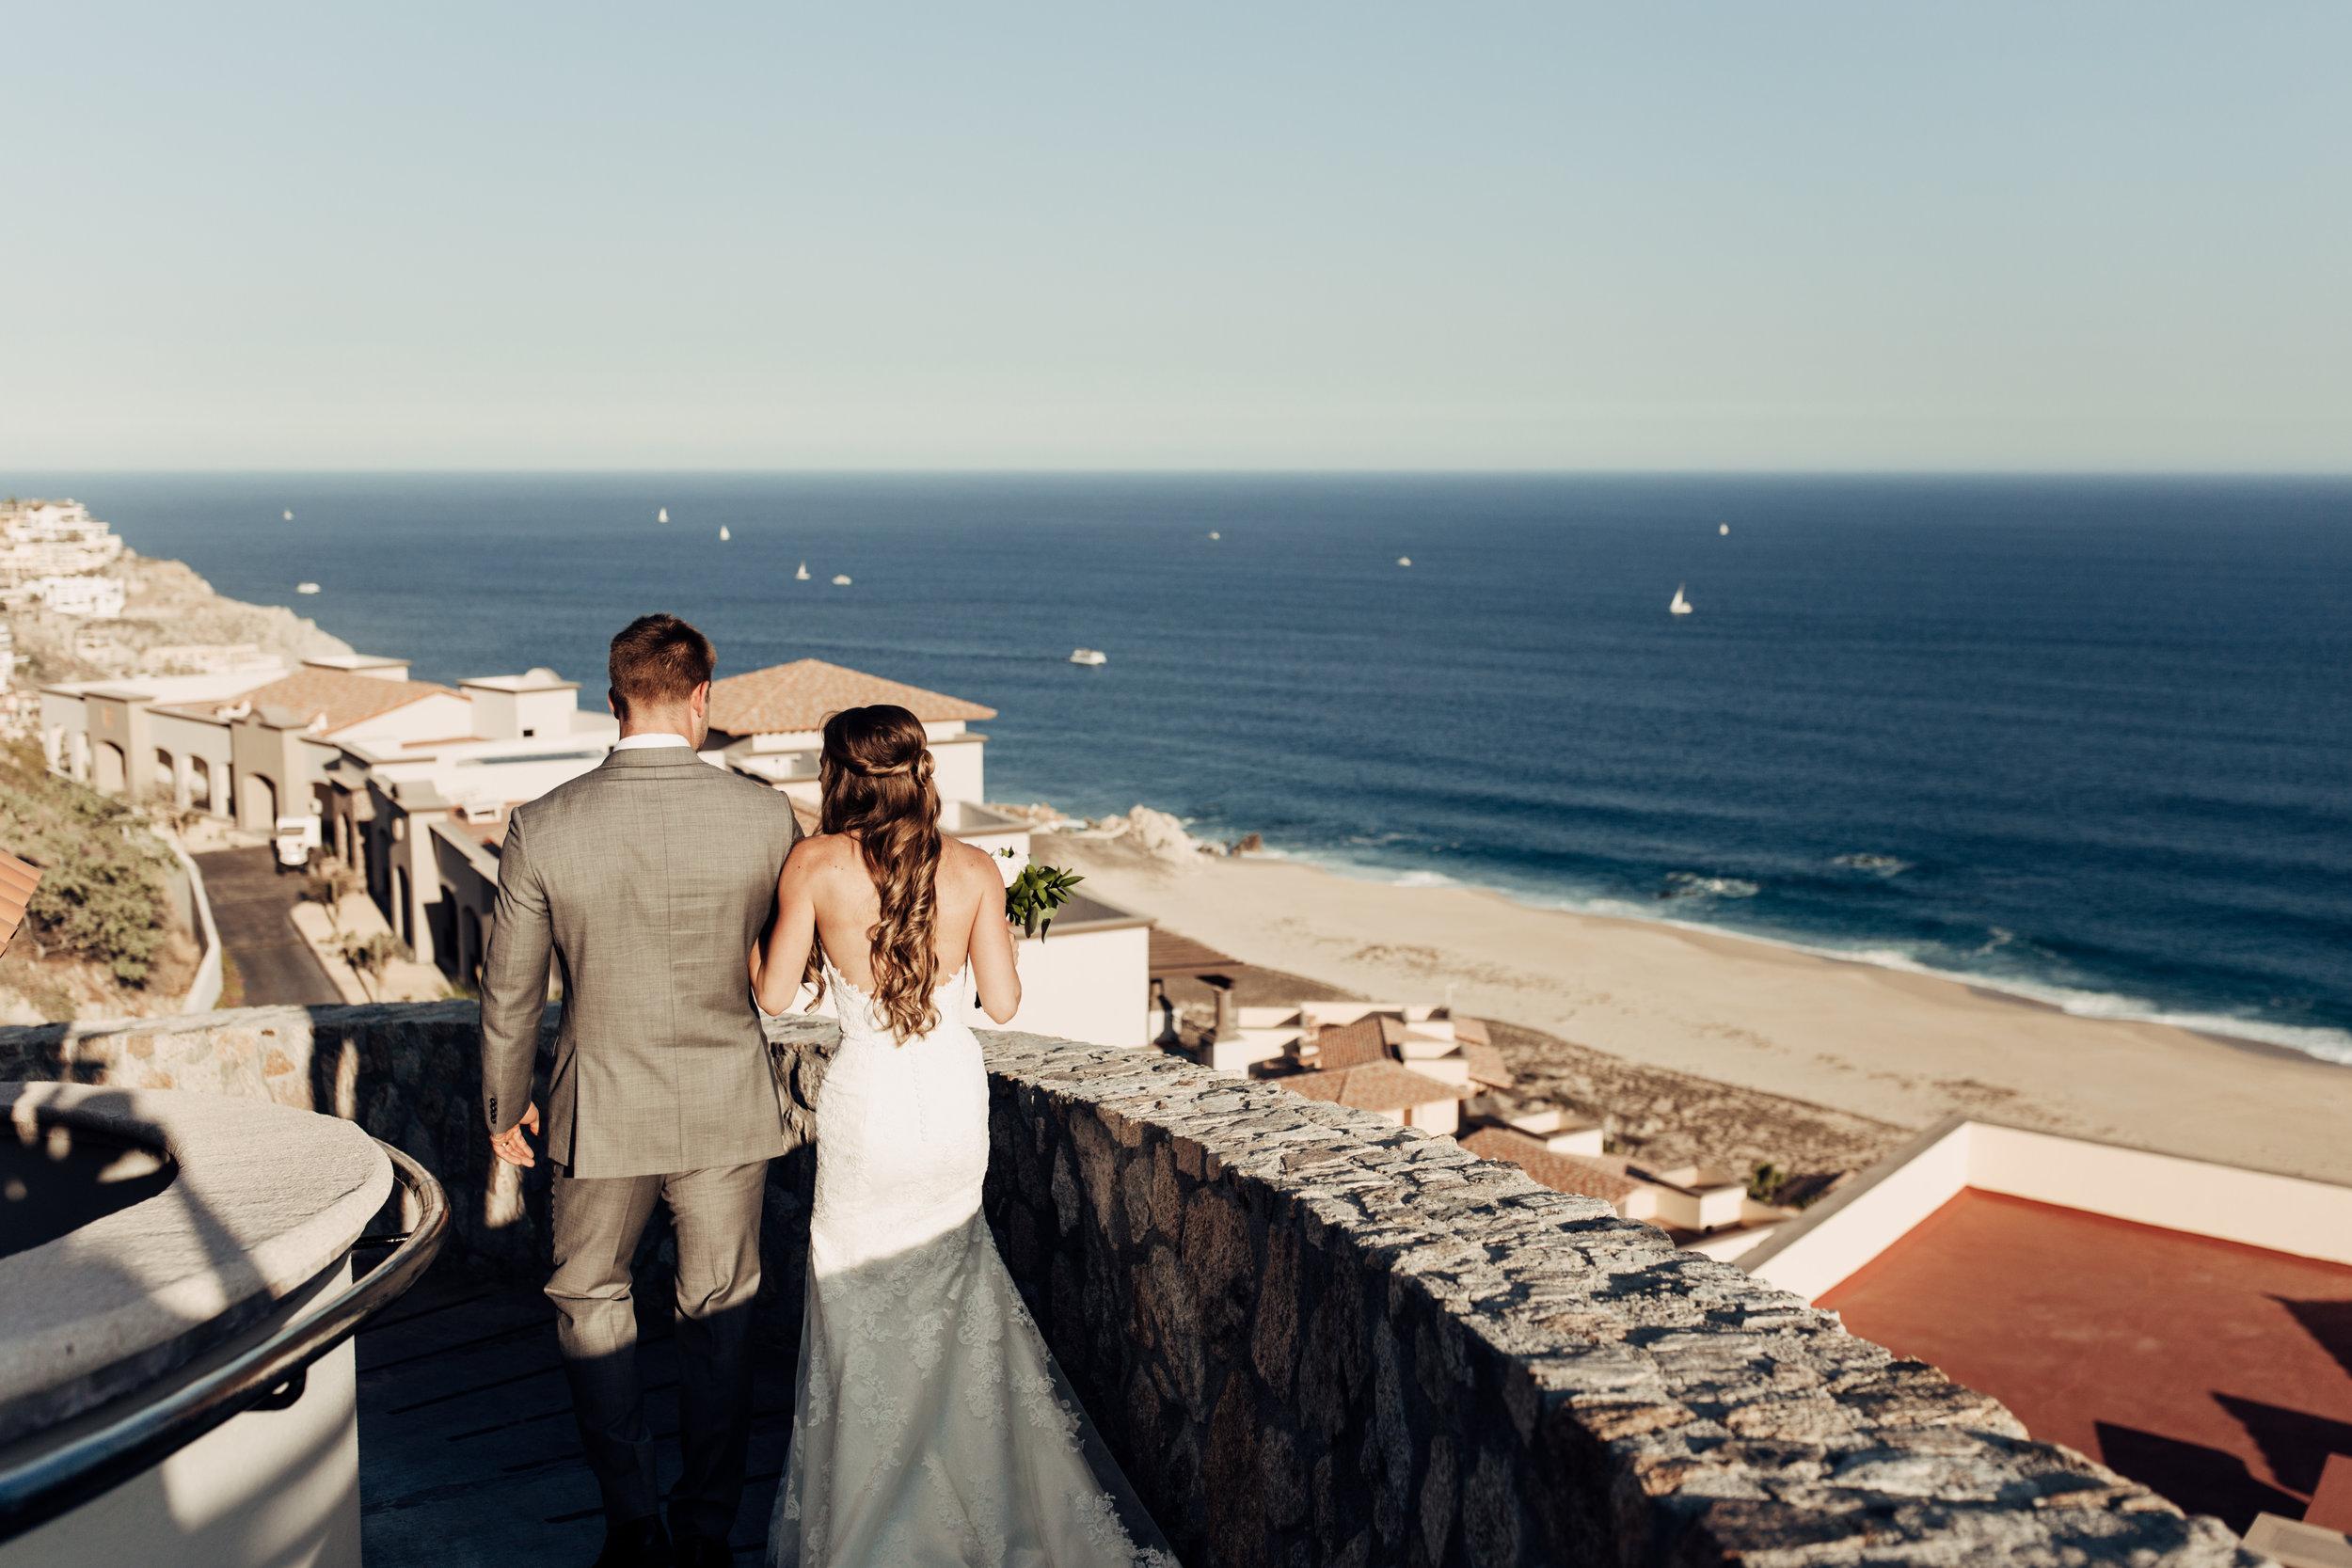 pueblo-bonito-sunset-beach-wedding-cabo-san-lucas352.jpg